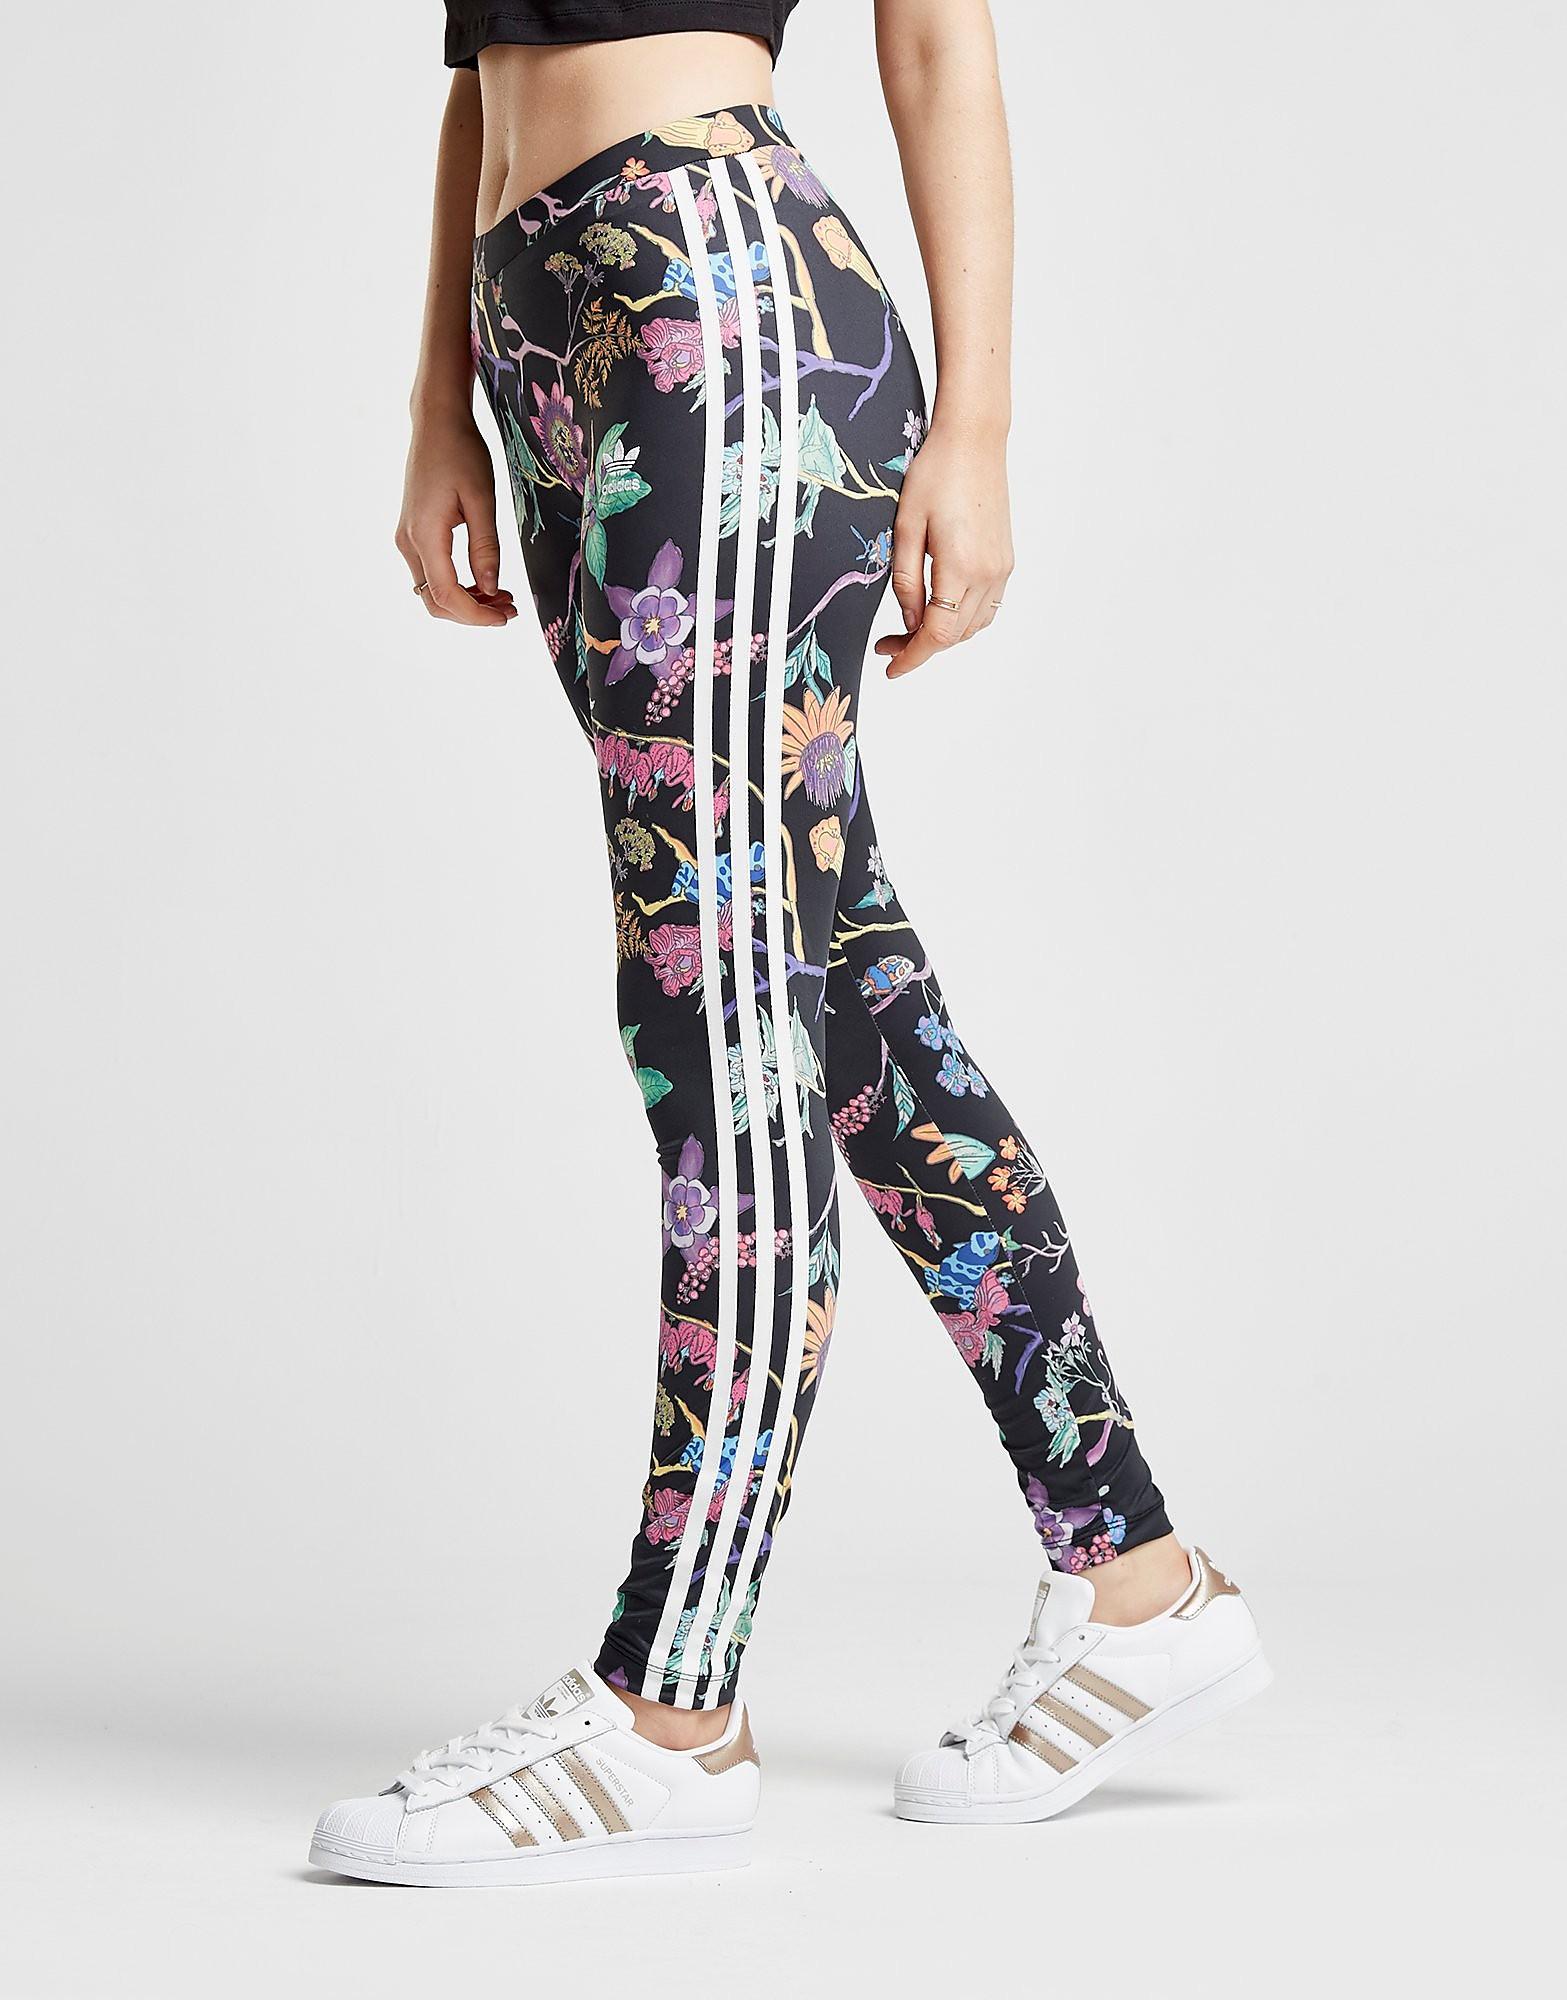 adidas Originals Legging Floral All Over Print Femme